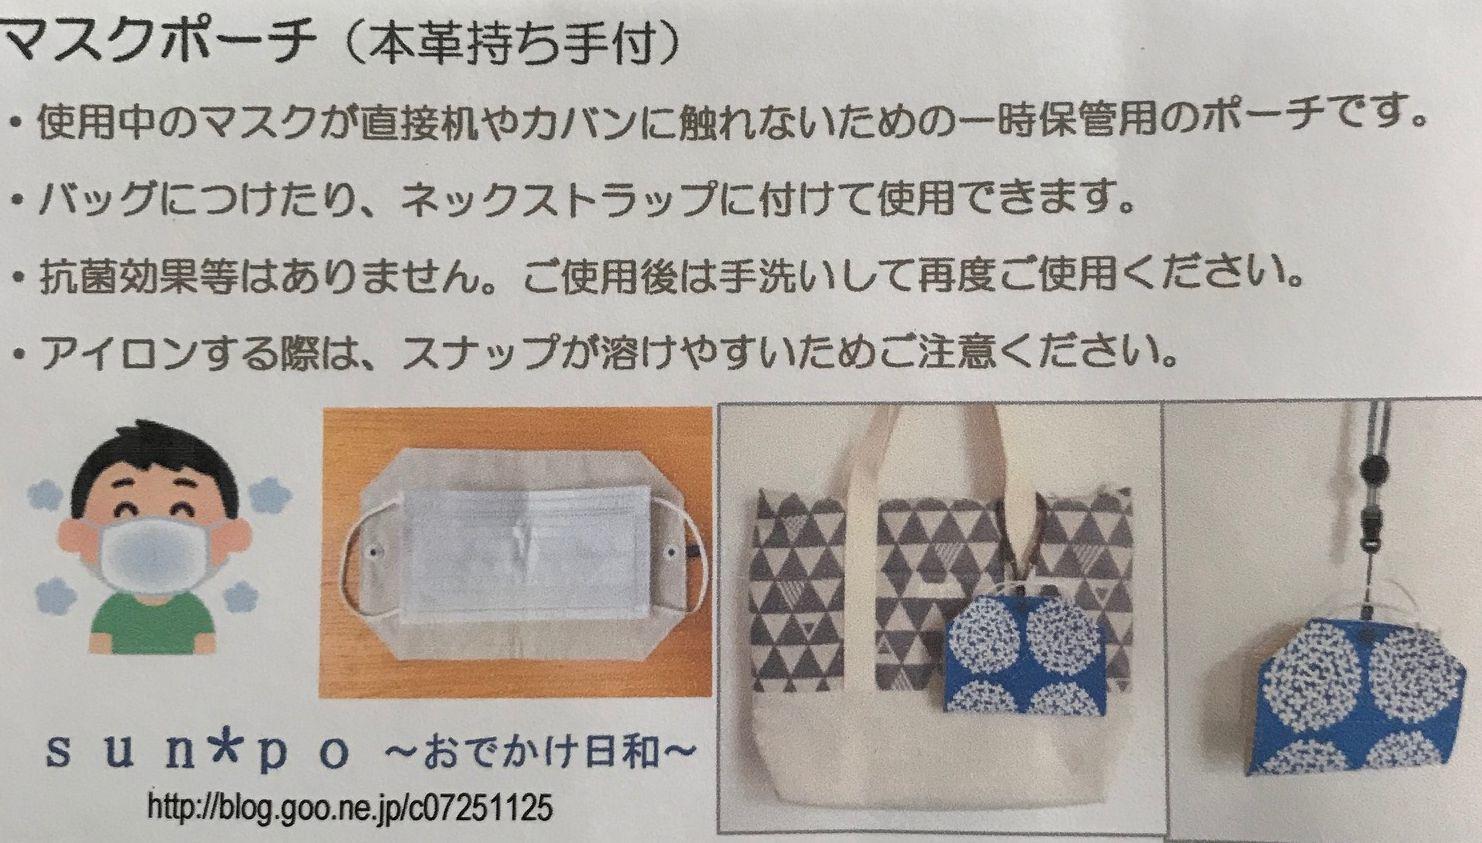 fuuさんのマスクポーチ&移動ポケット_a0081907_09234811.jpeg